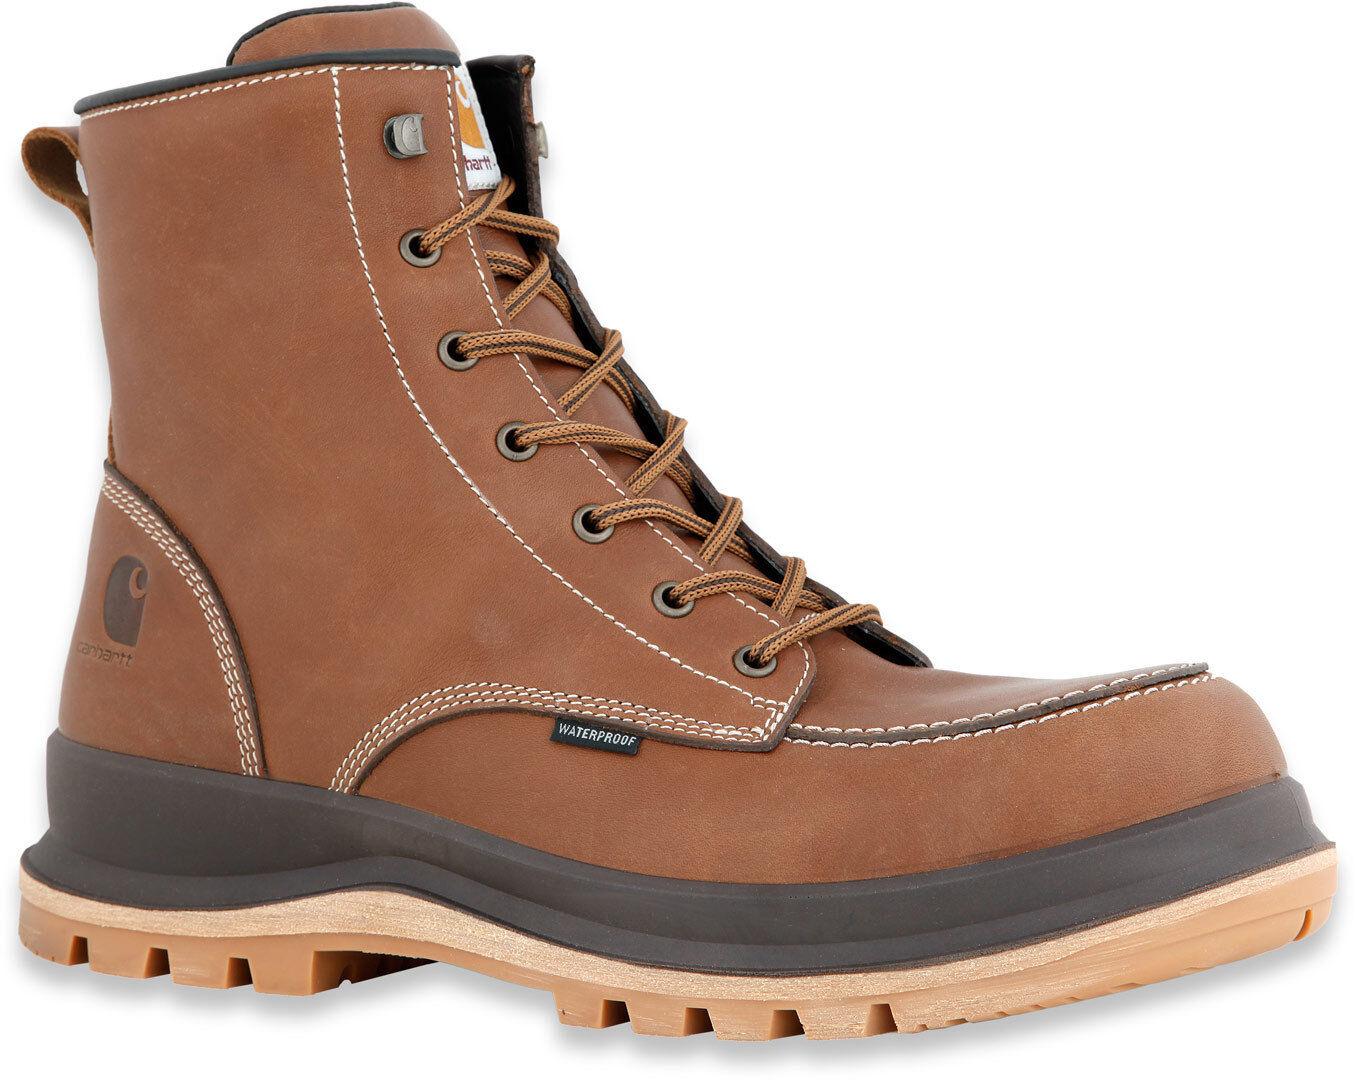 Carhartt Hamilton Rugged Flex S3 Boots Brown 41